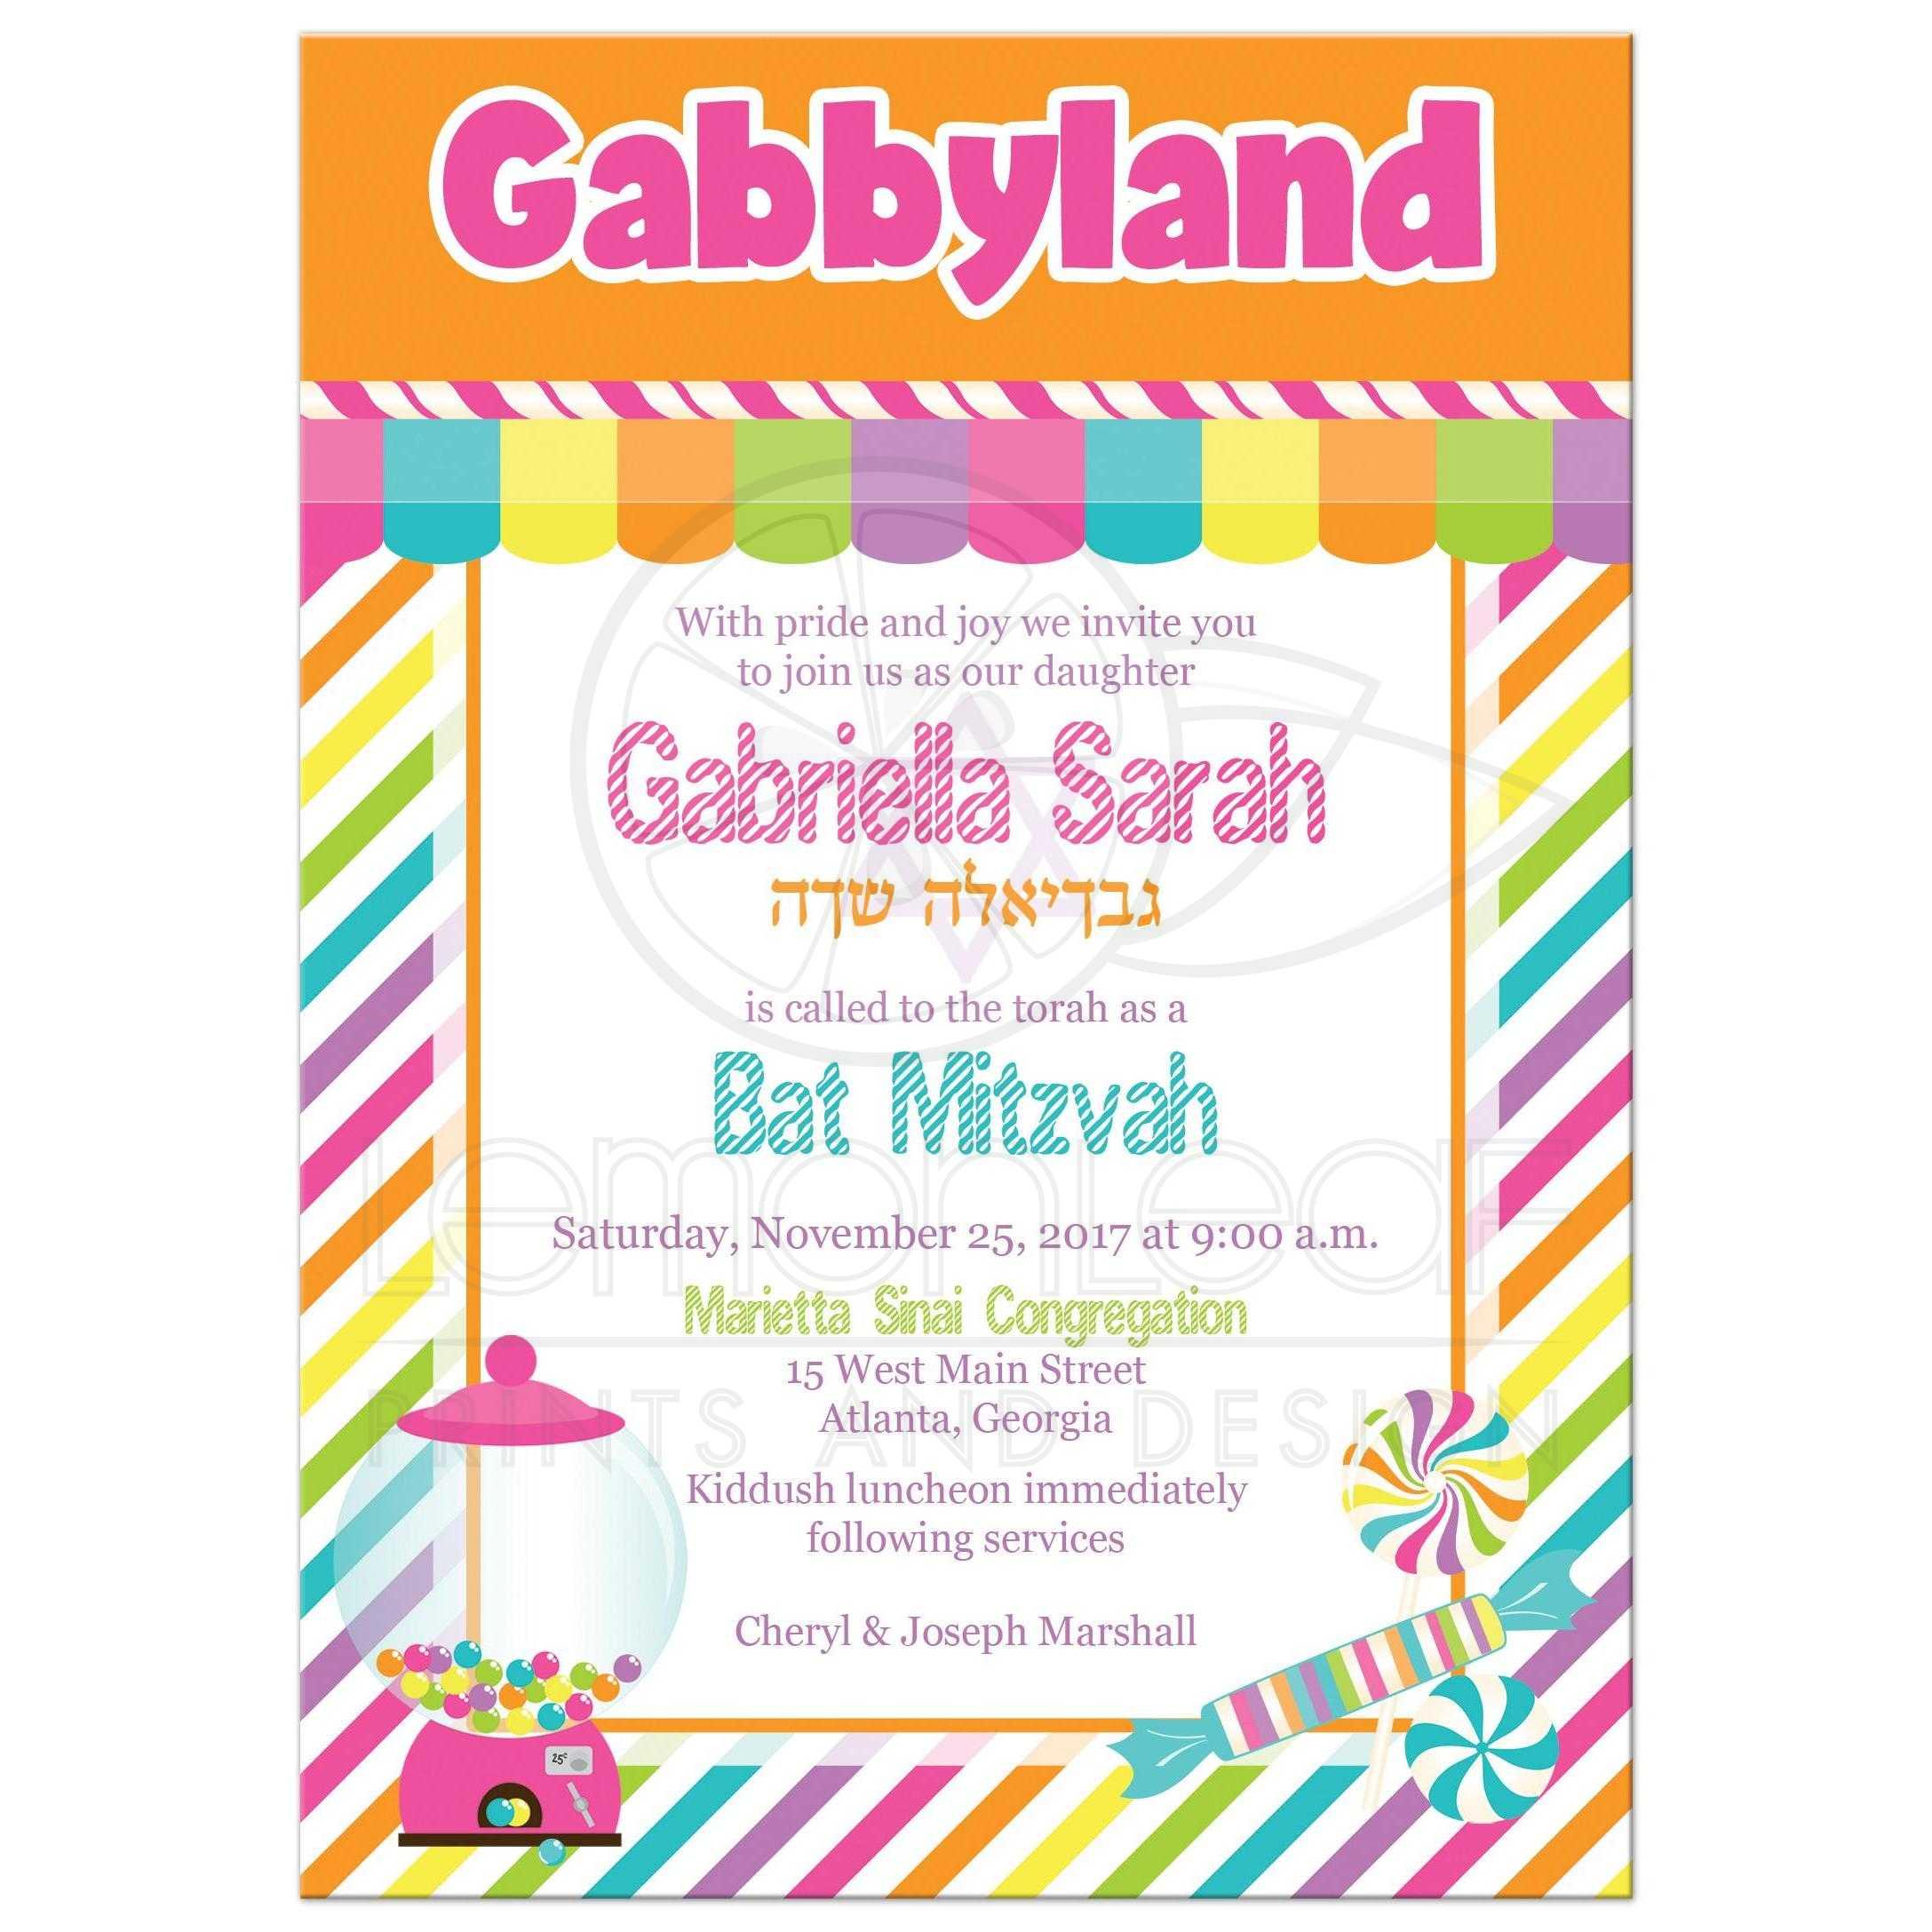 Candyland Bat Mitzvah Invitation | Bright Colored Candies, Stripes ...